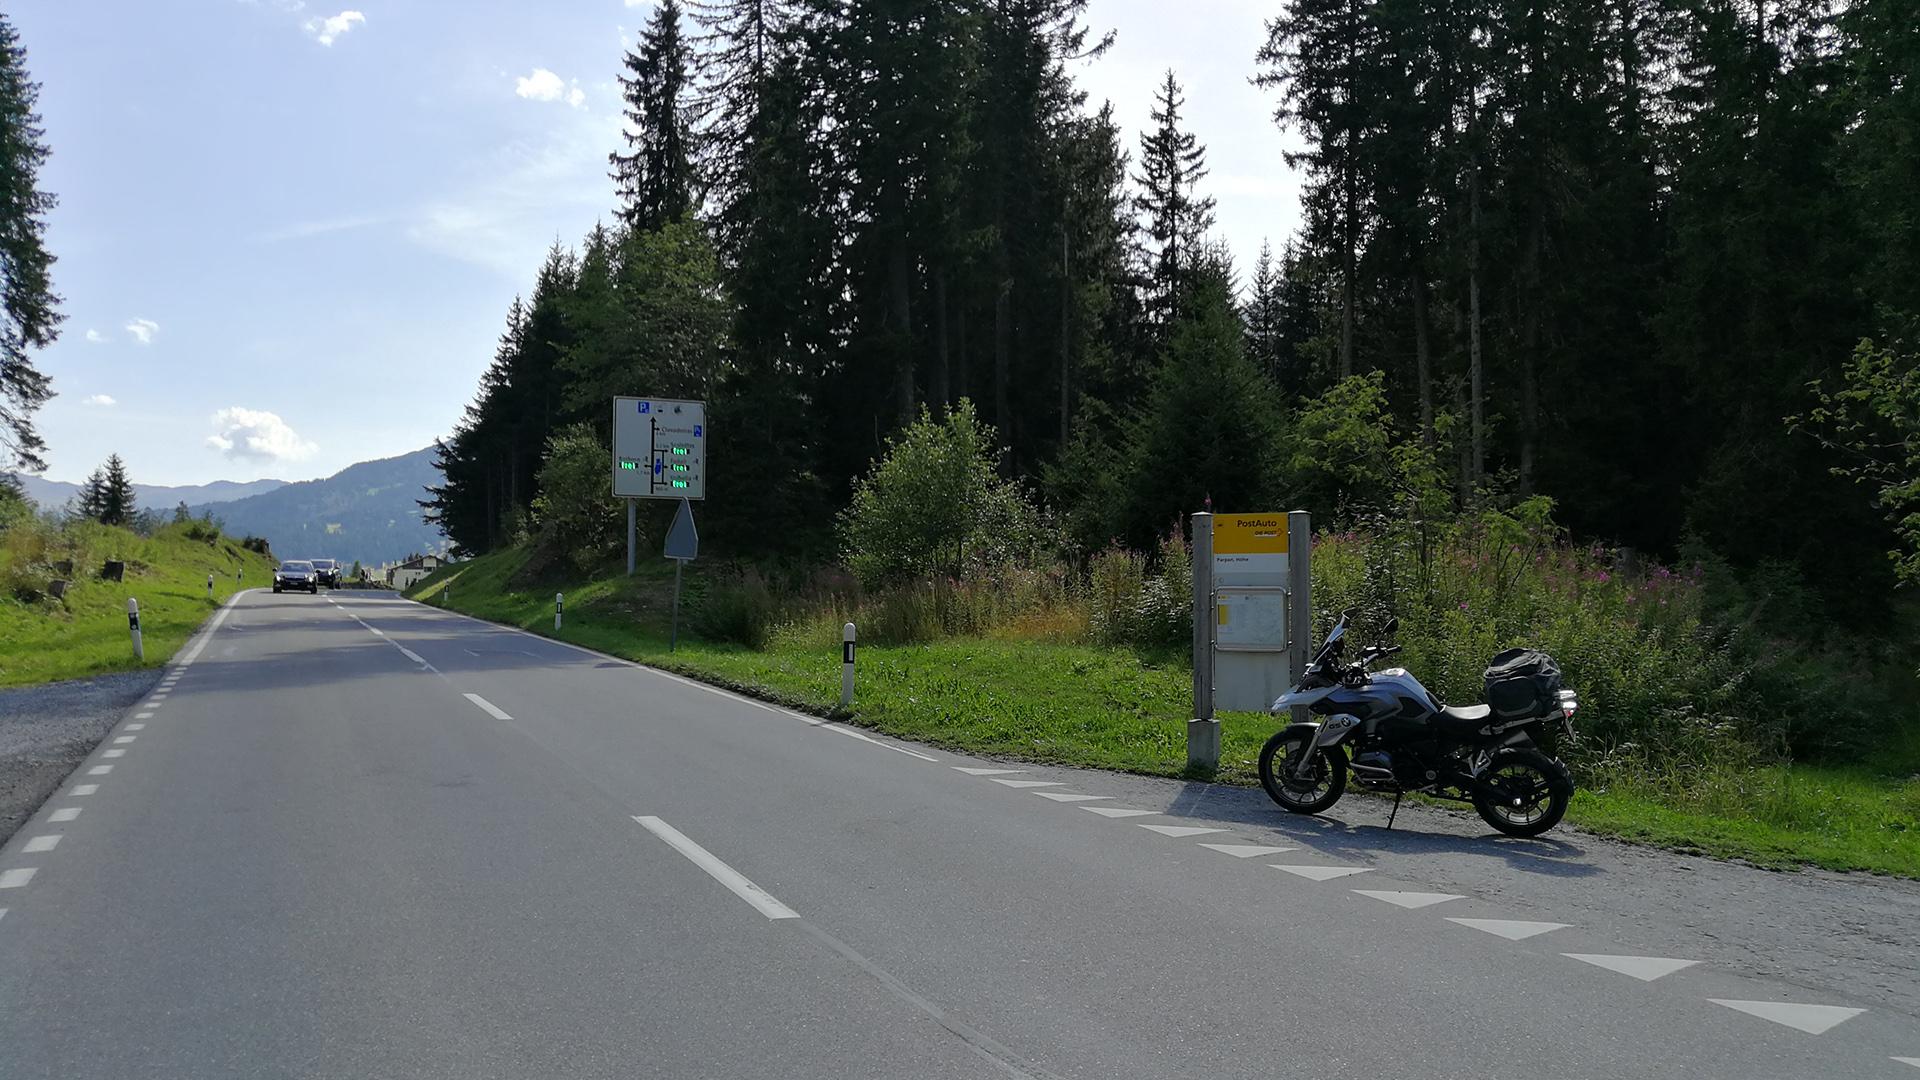 1547 - CH - Lenzerheide (Parpan Höhe)